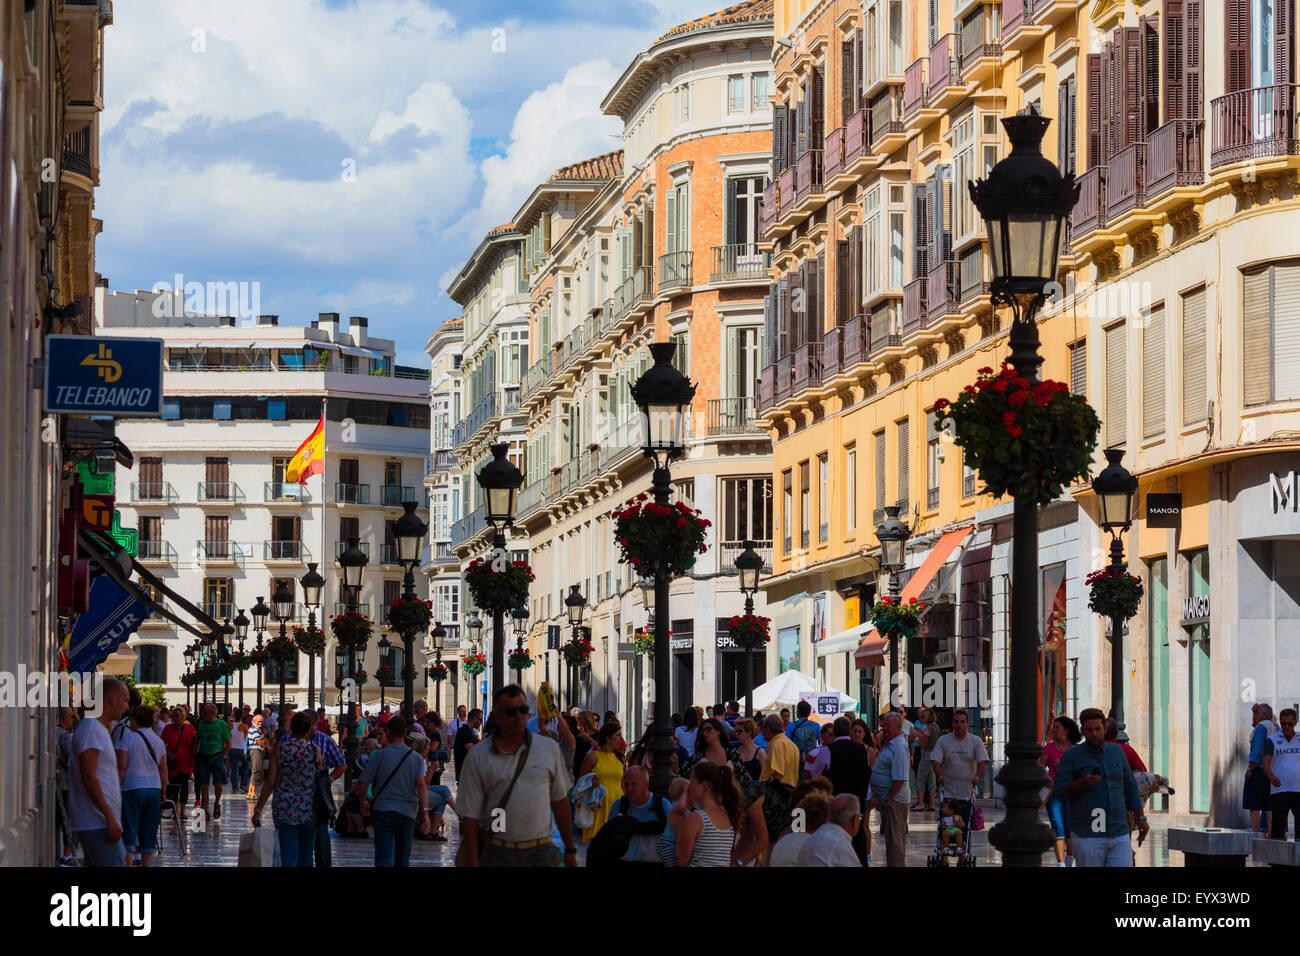 Malaga, Malaga Province, Costa del Sol, Andalusia, southern Spain.  The main street of Malaga, Calle Larios. - Stock Image